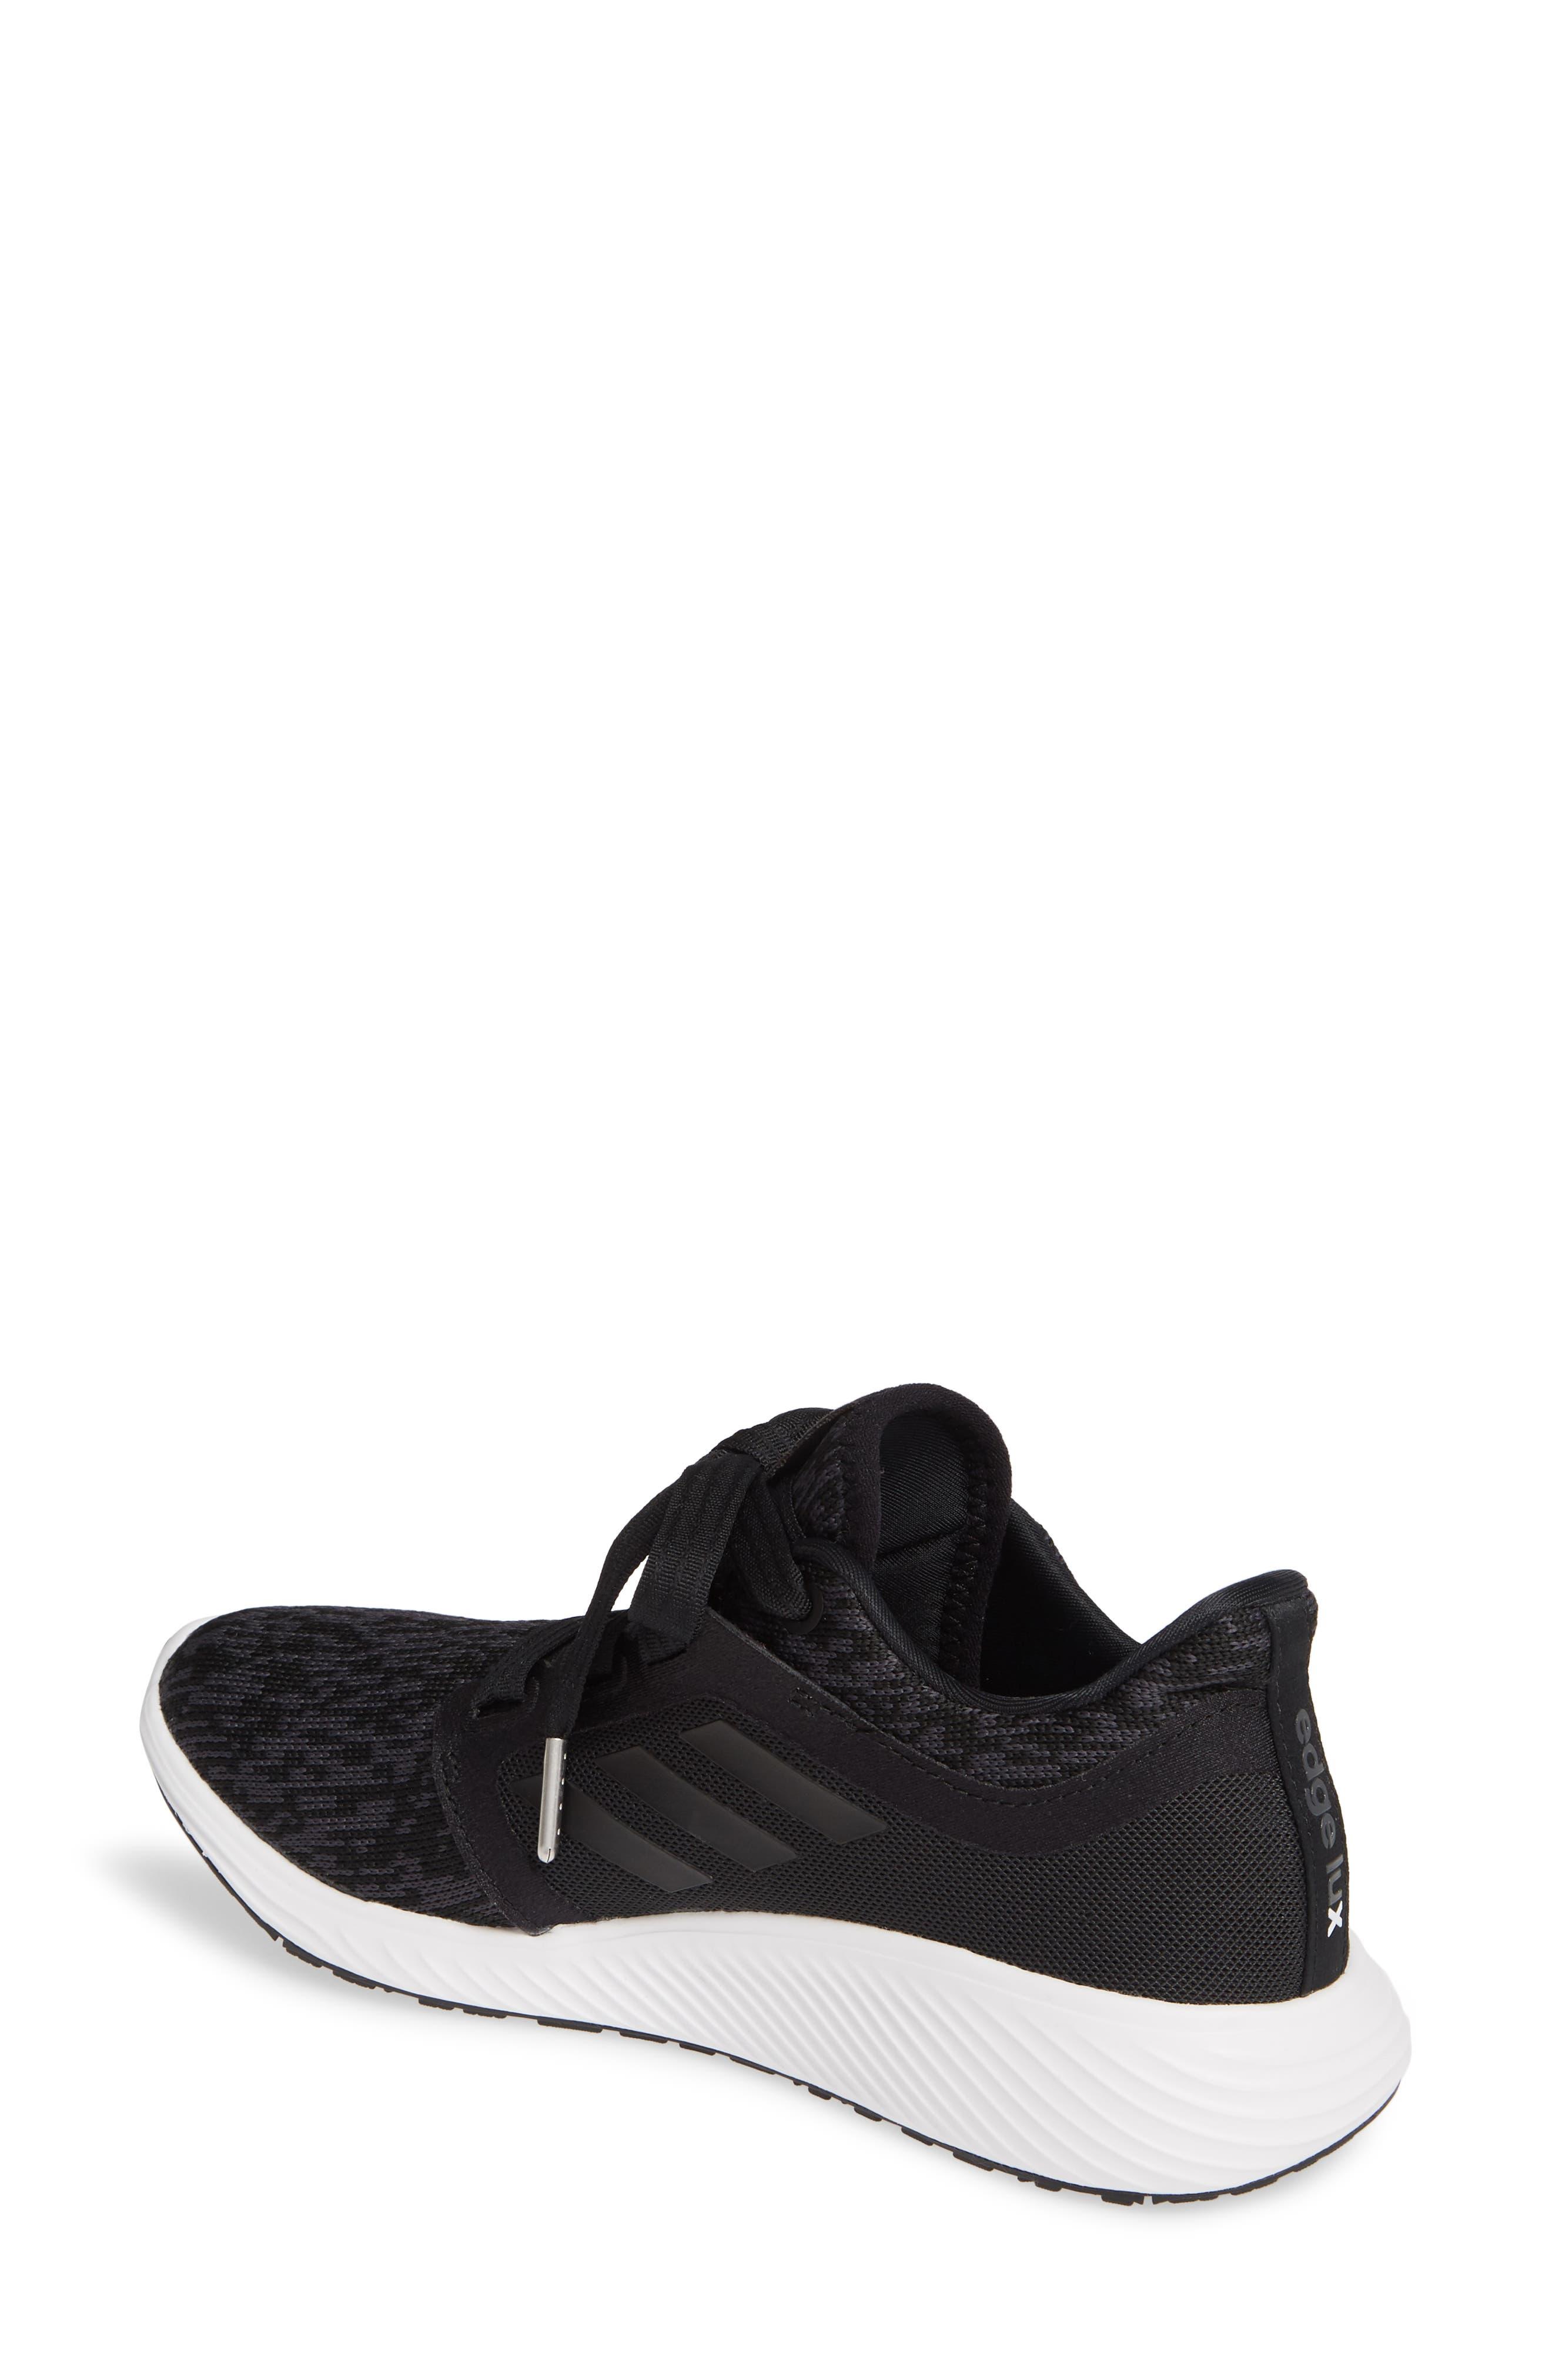 ADIDAS, Edge Lux 3 Running Shoe, Alternate thumbnail 2, color, CORE BLACK/ WHITE